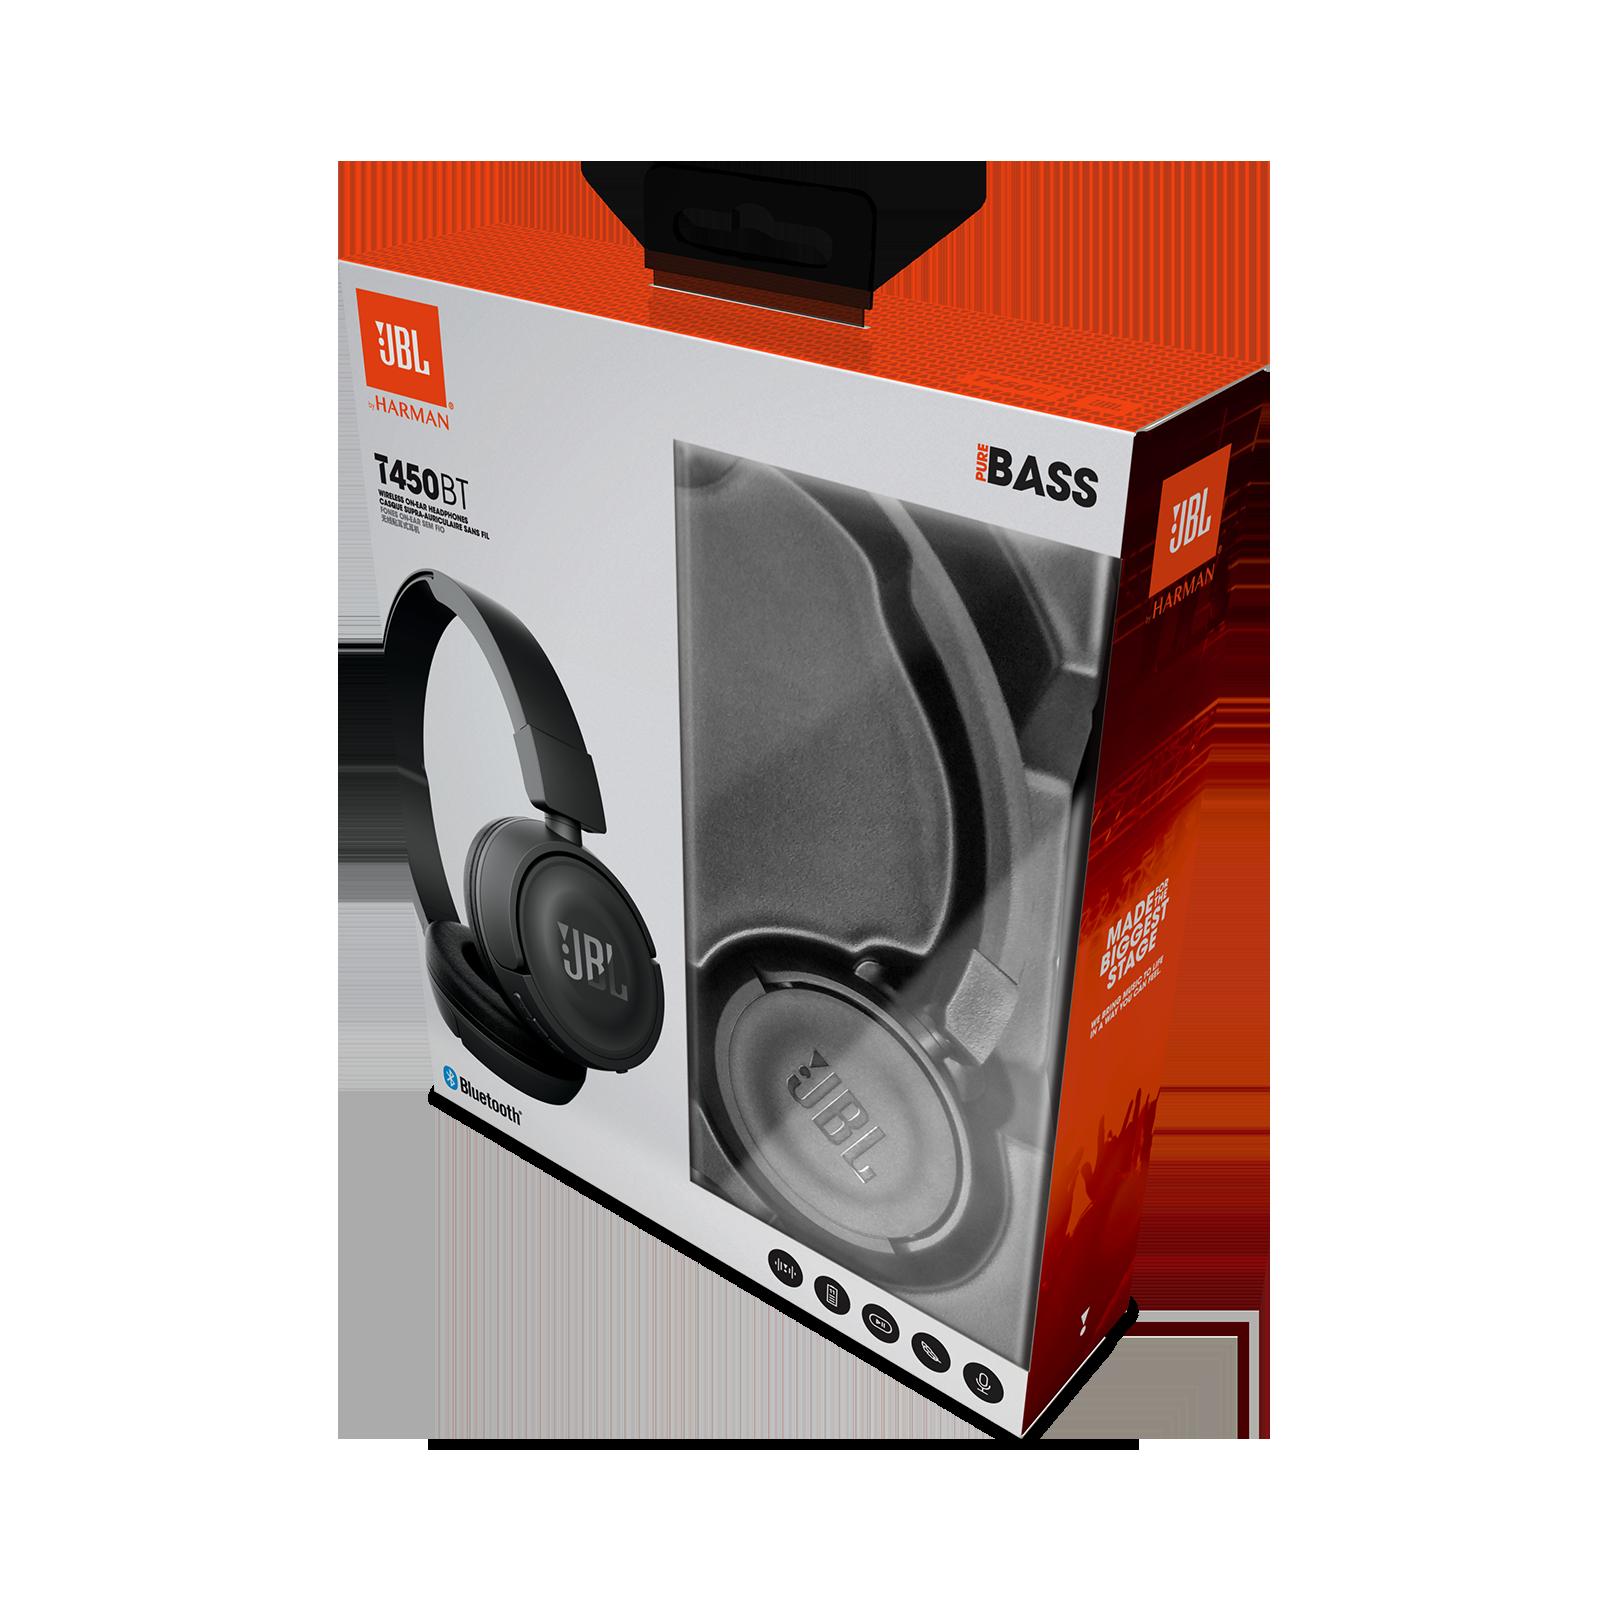 e448c29caad JBL T450BT | Wireless on-ear headphones